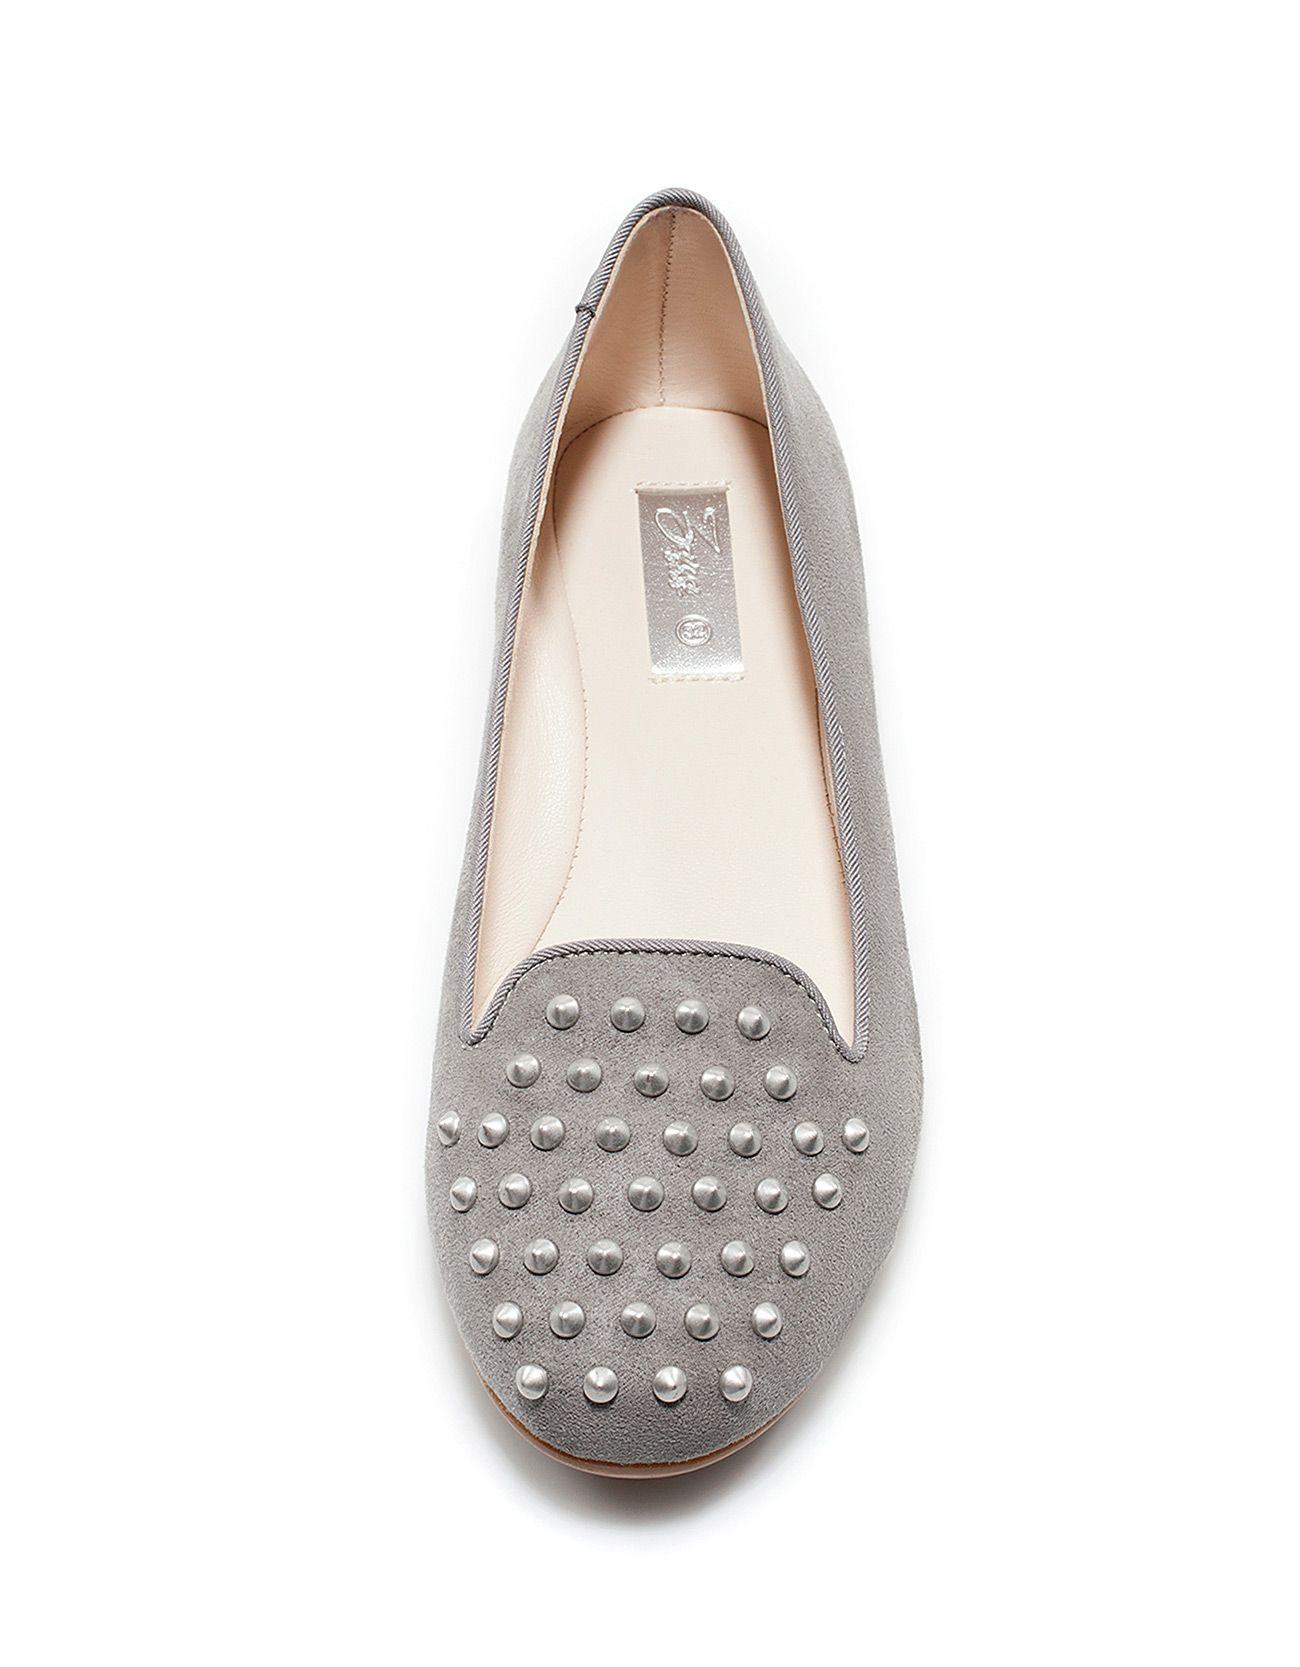 Zapatos Tachas 14 Años 2 Niña Slip Nueva On Niños BTqwSS